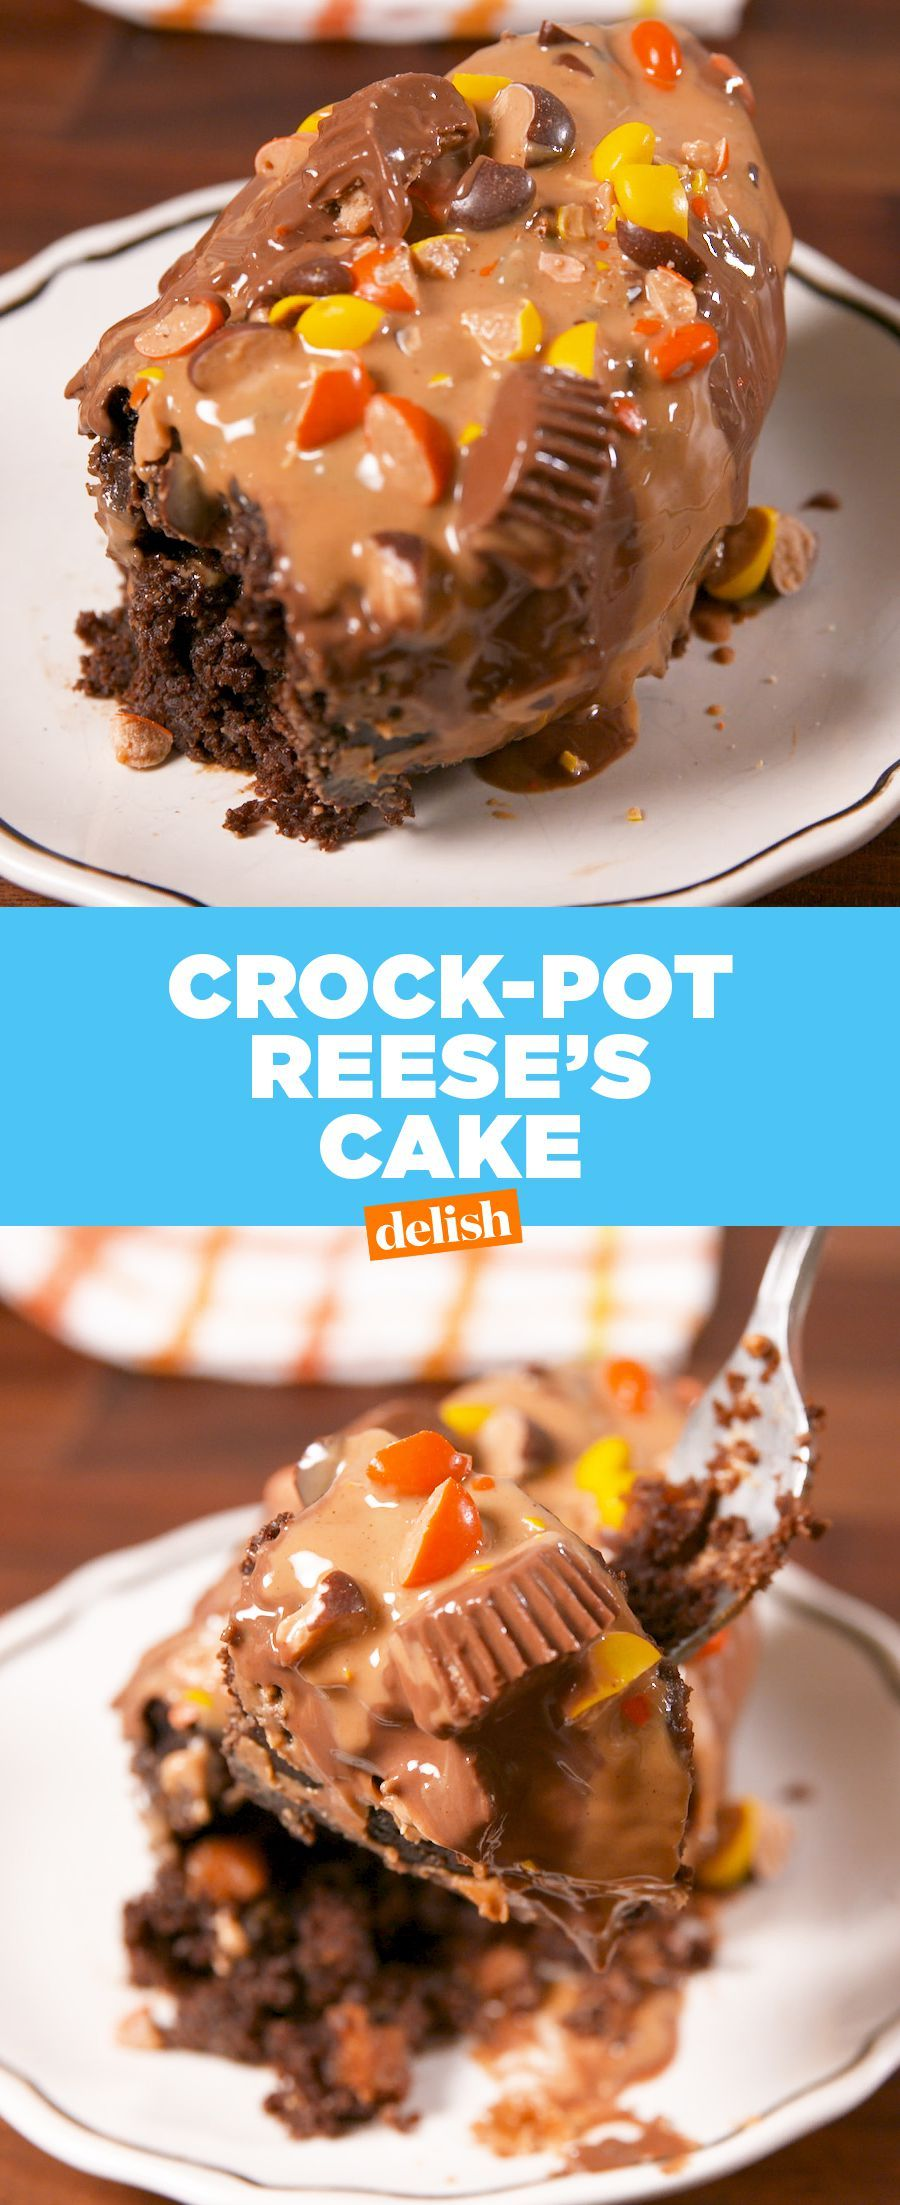 Crock Pot Reese S Cake Recipe Crock Pot Desserts Reeses Cake